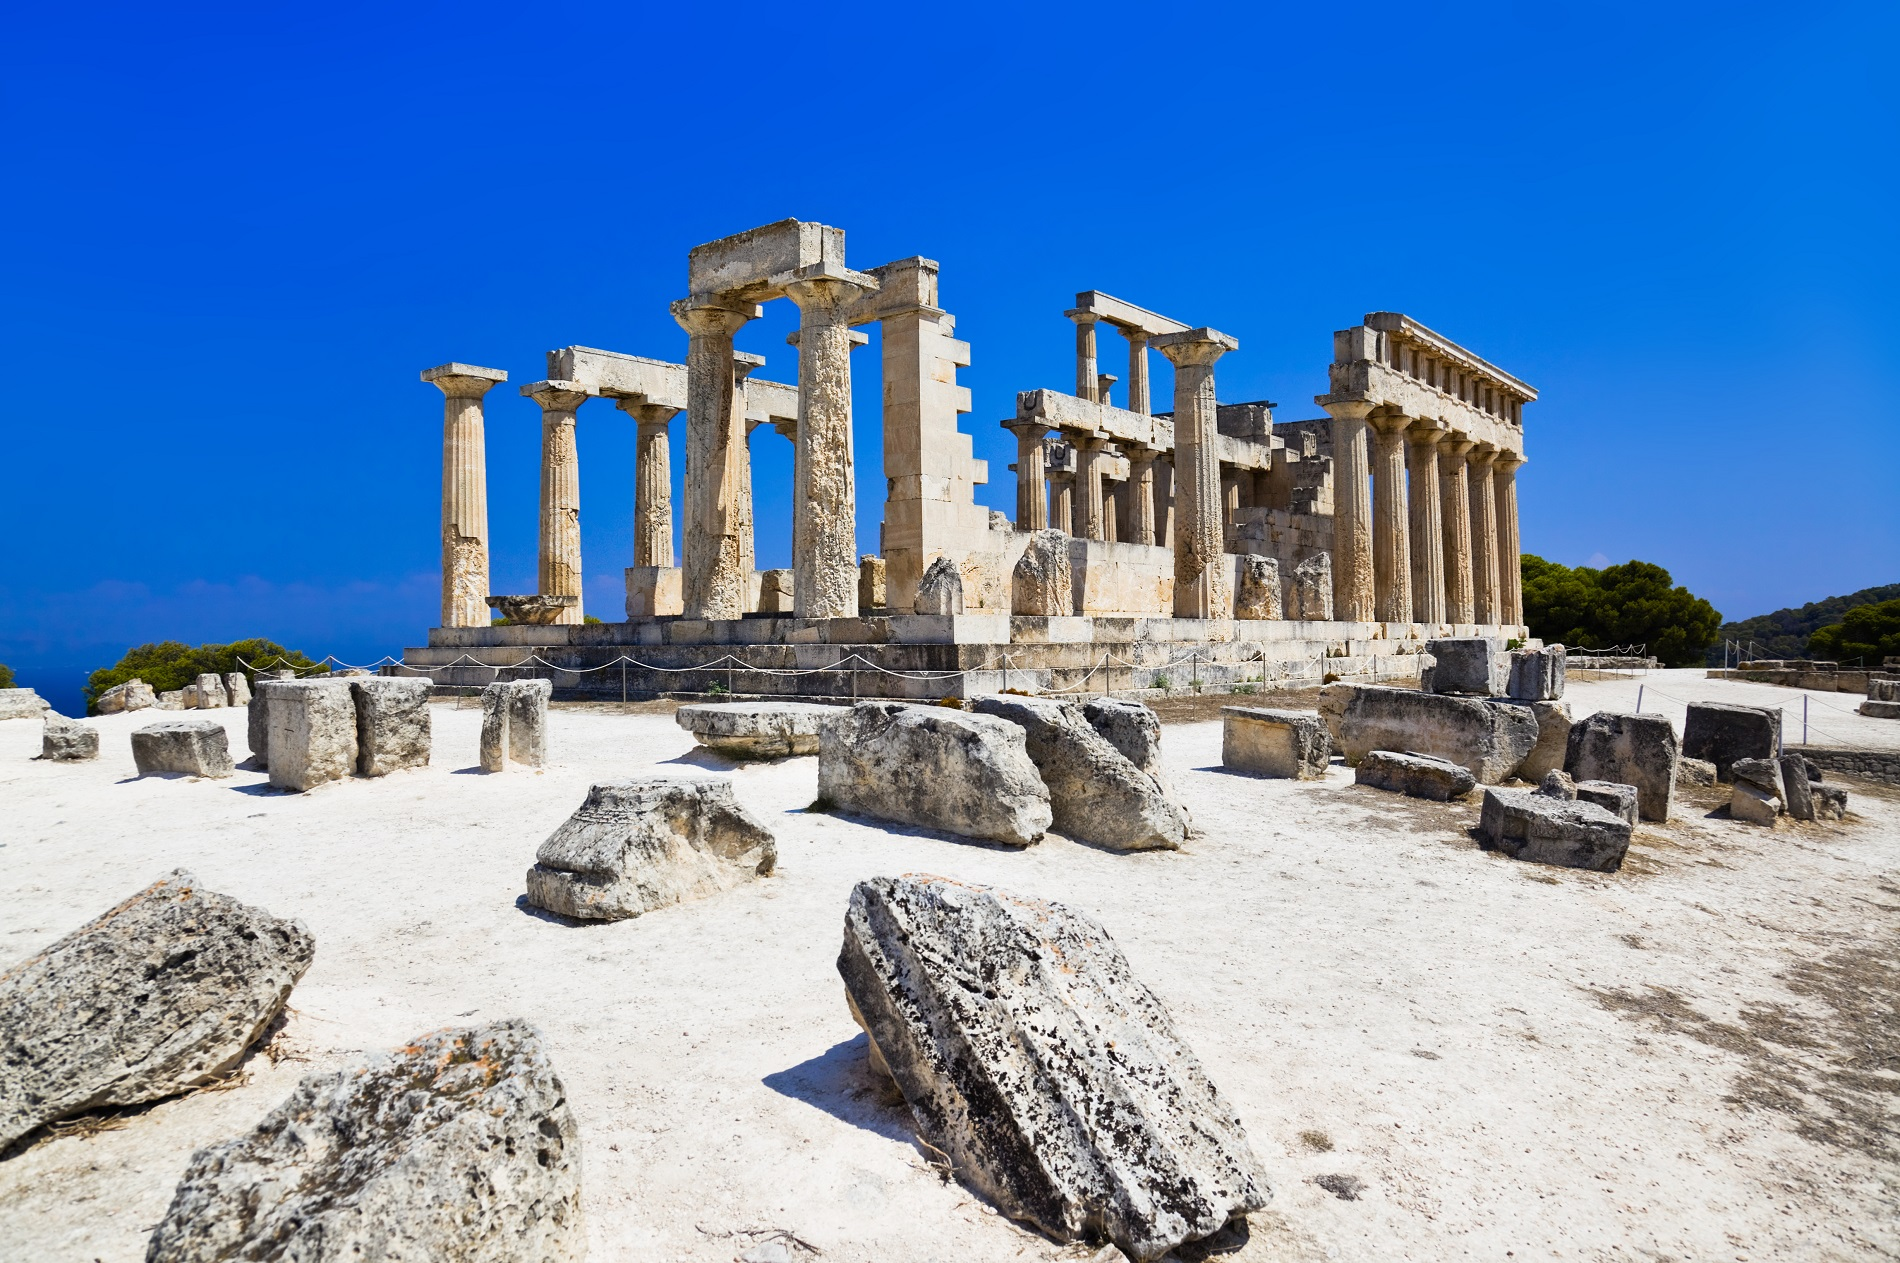 Afaia temple in Aegina